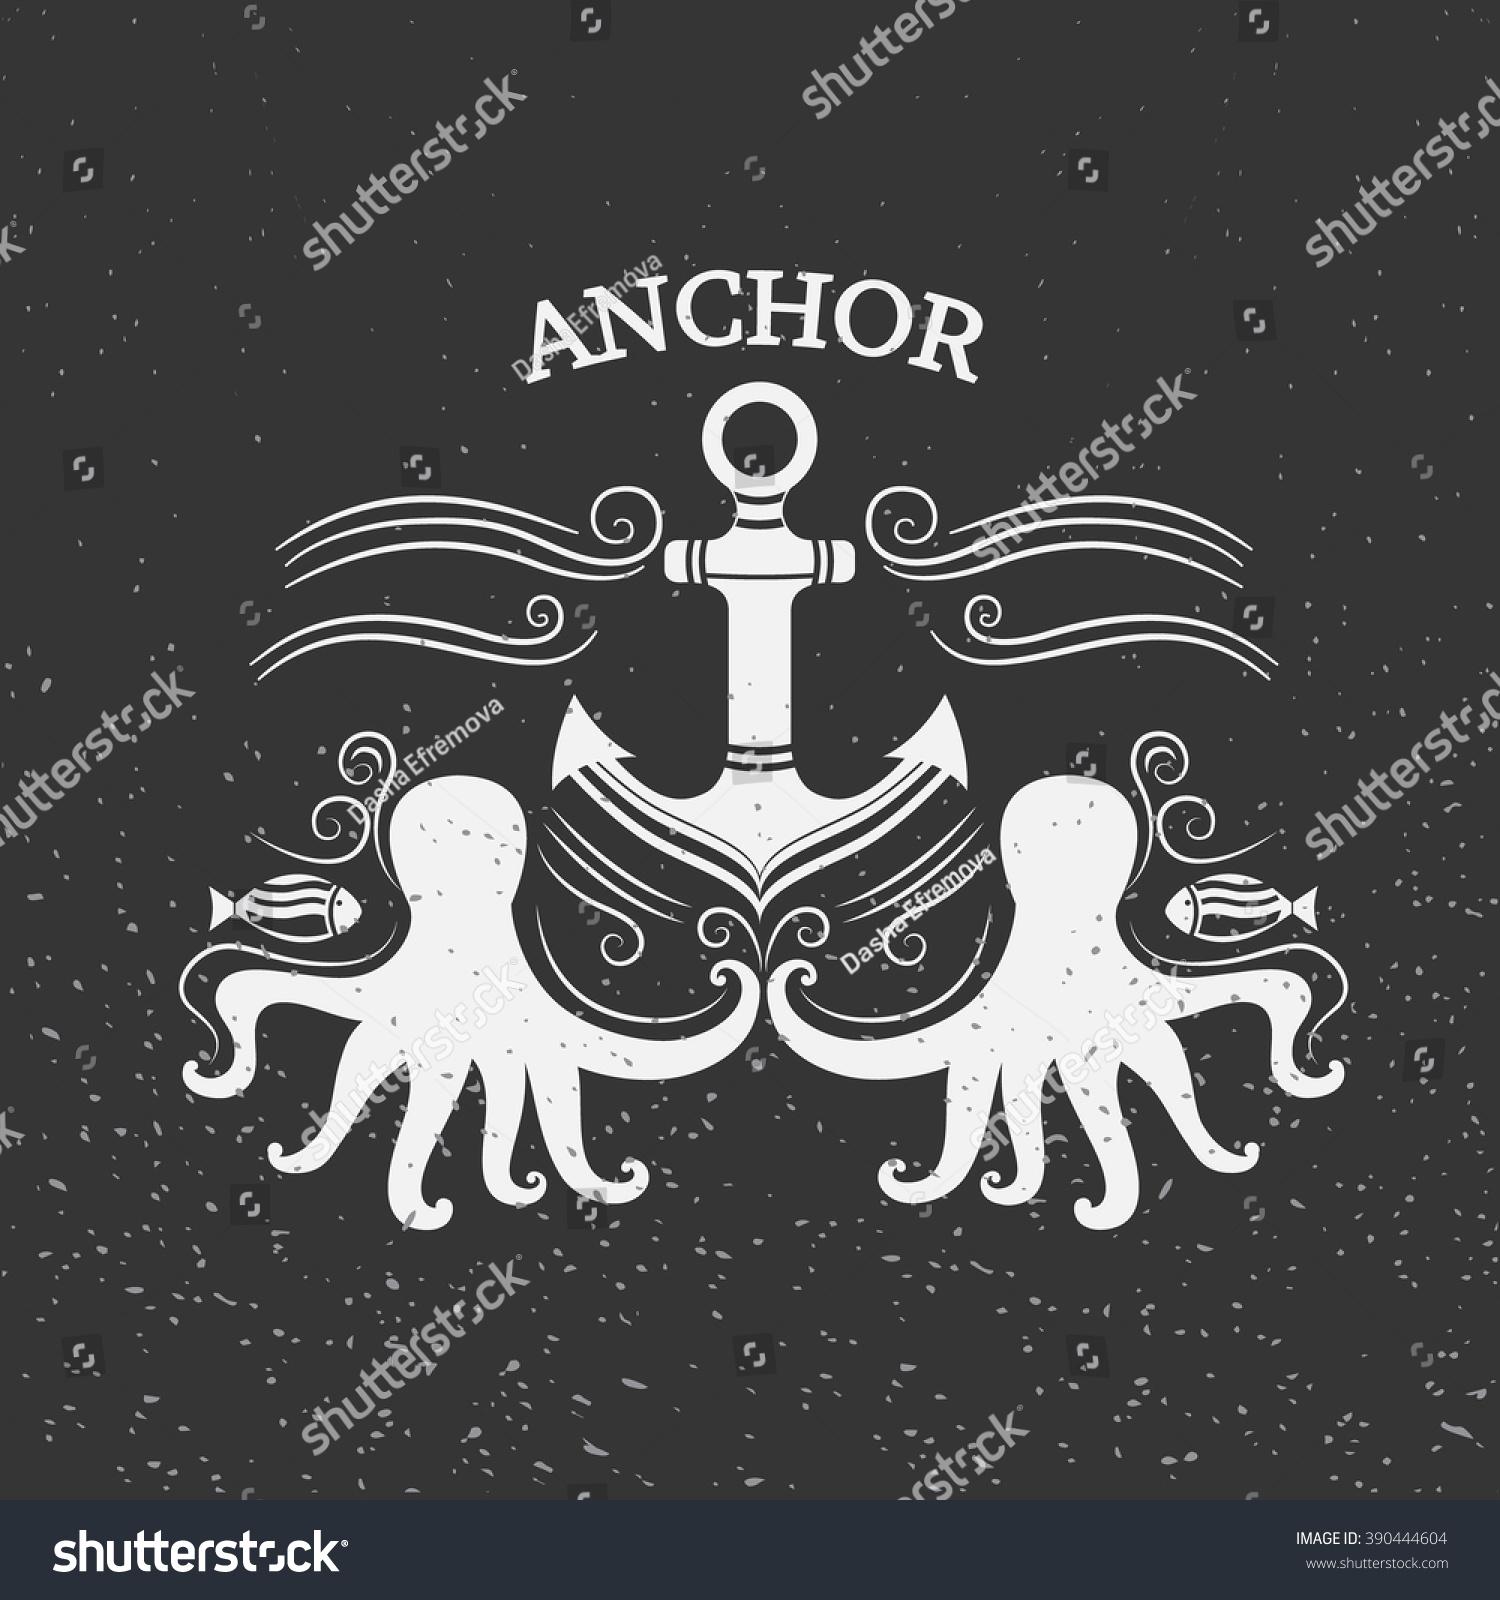 Shirt design octopus - Save To A Lightbox